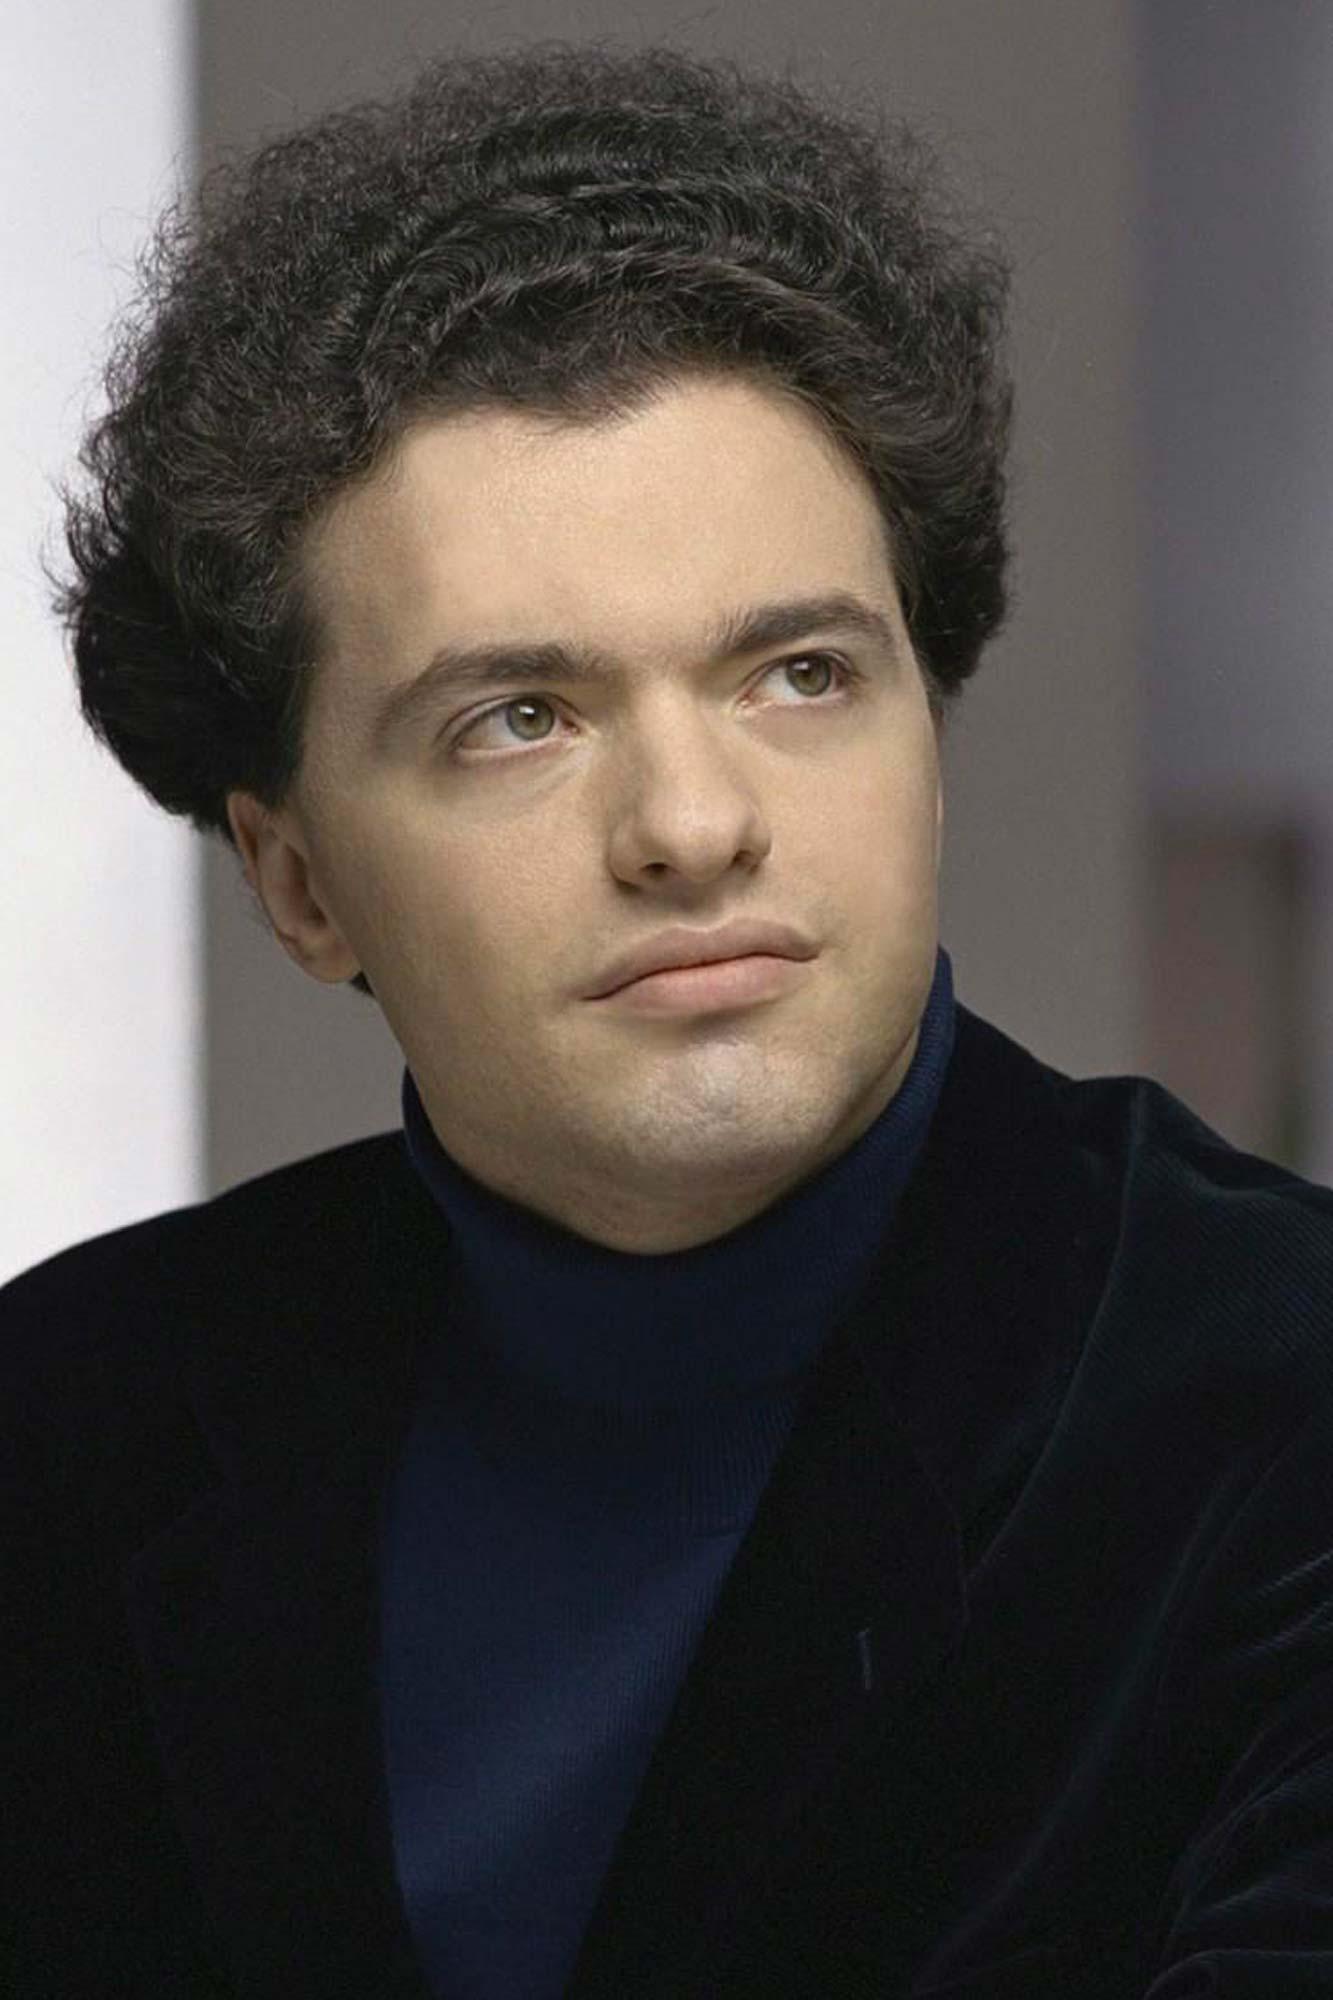 4-dicembre-Evgeny-Kissin.jpg